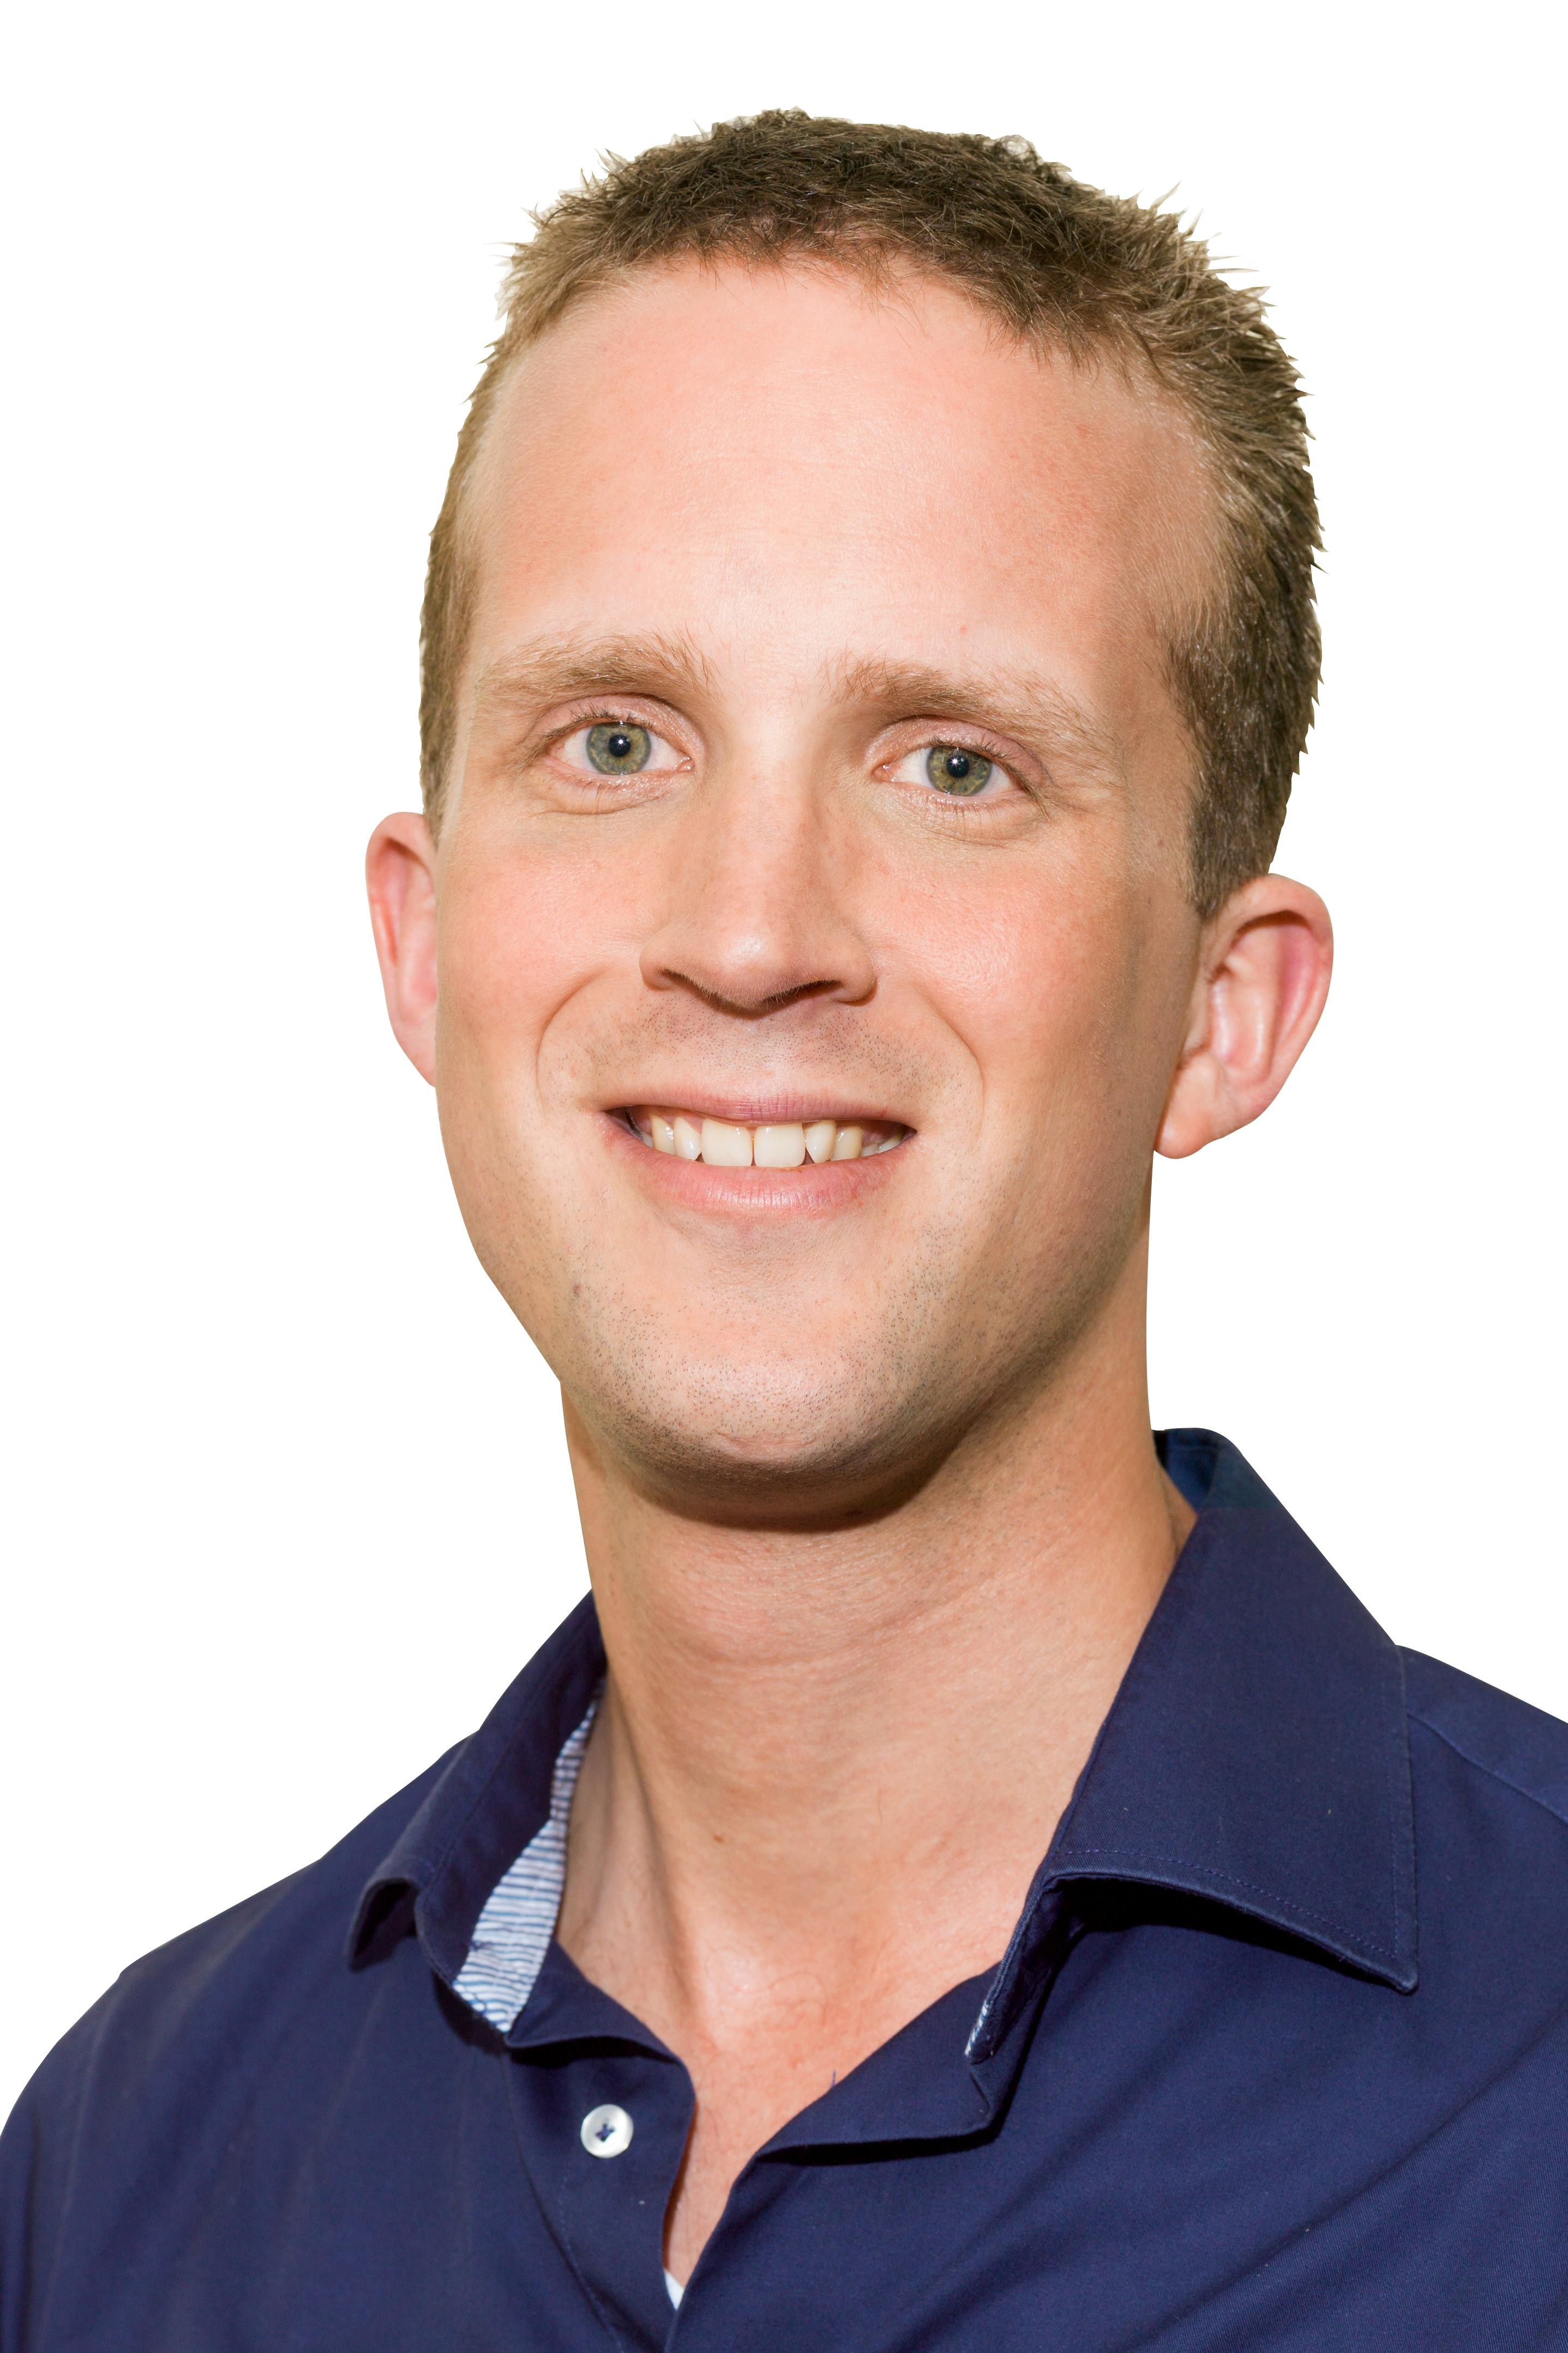 Sander Bolt